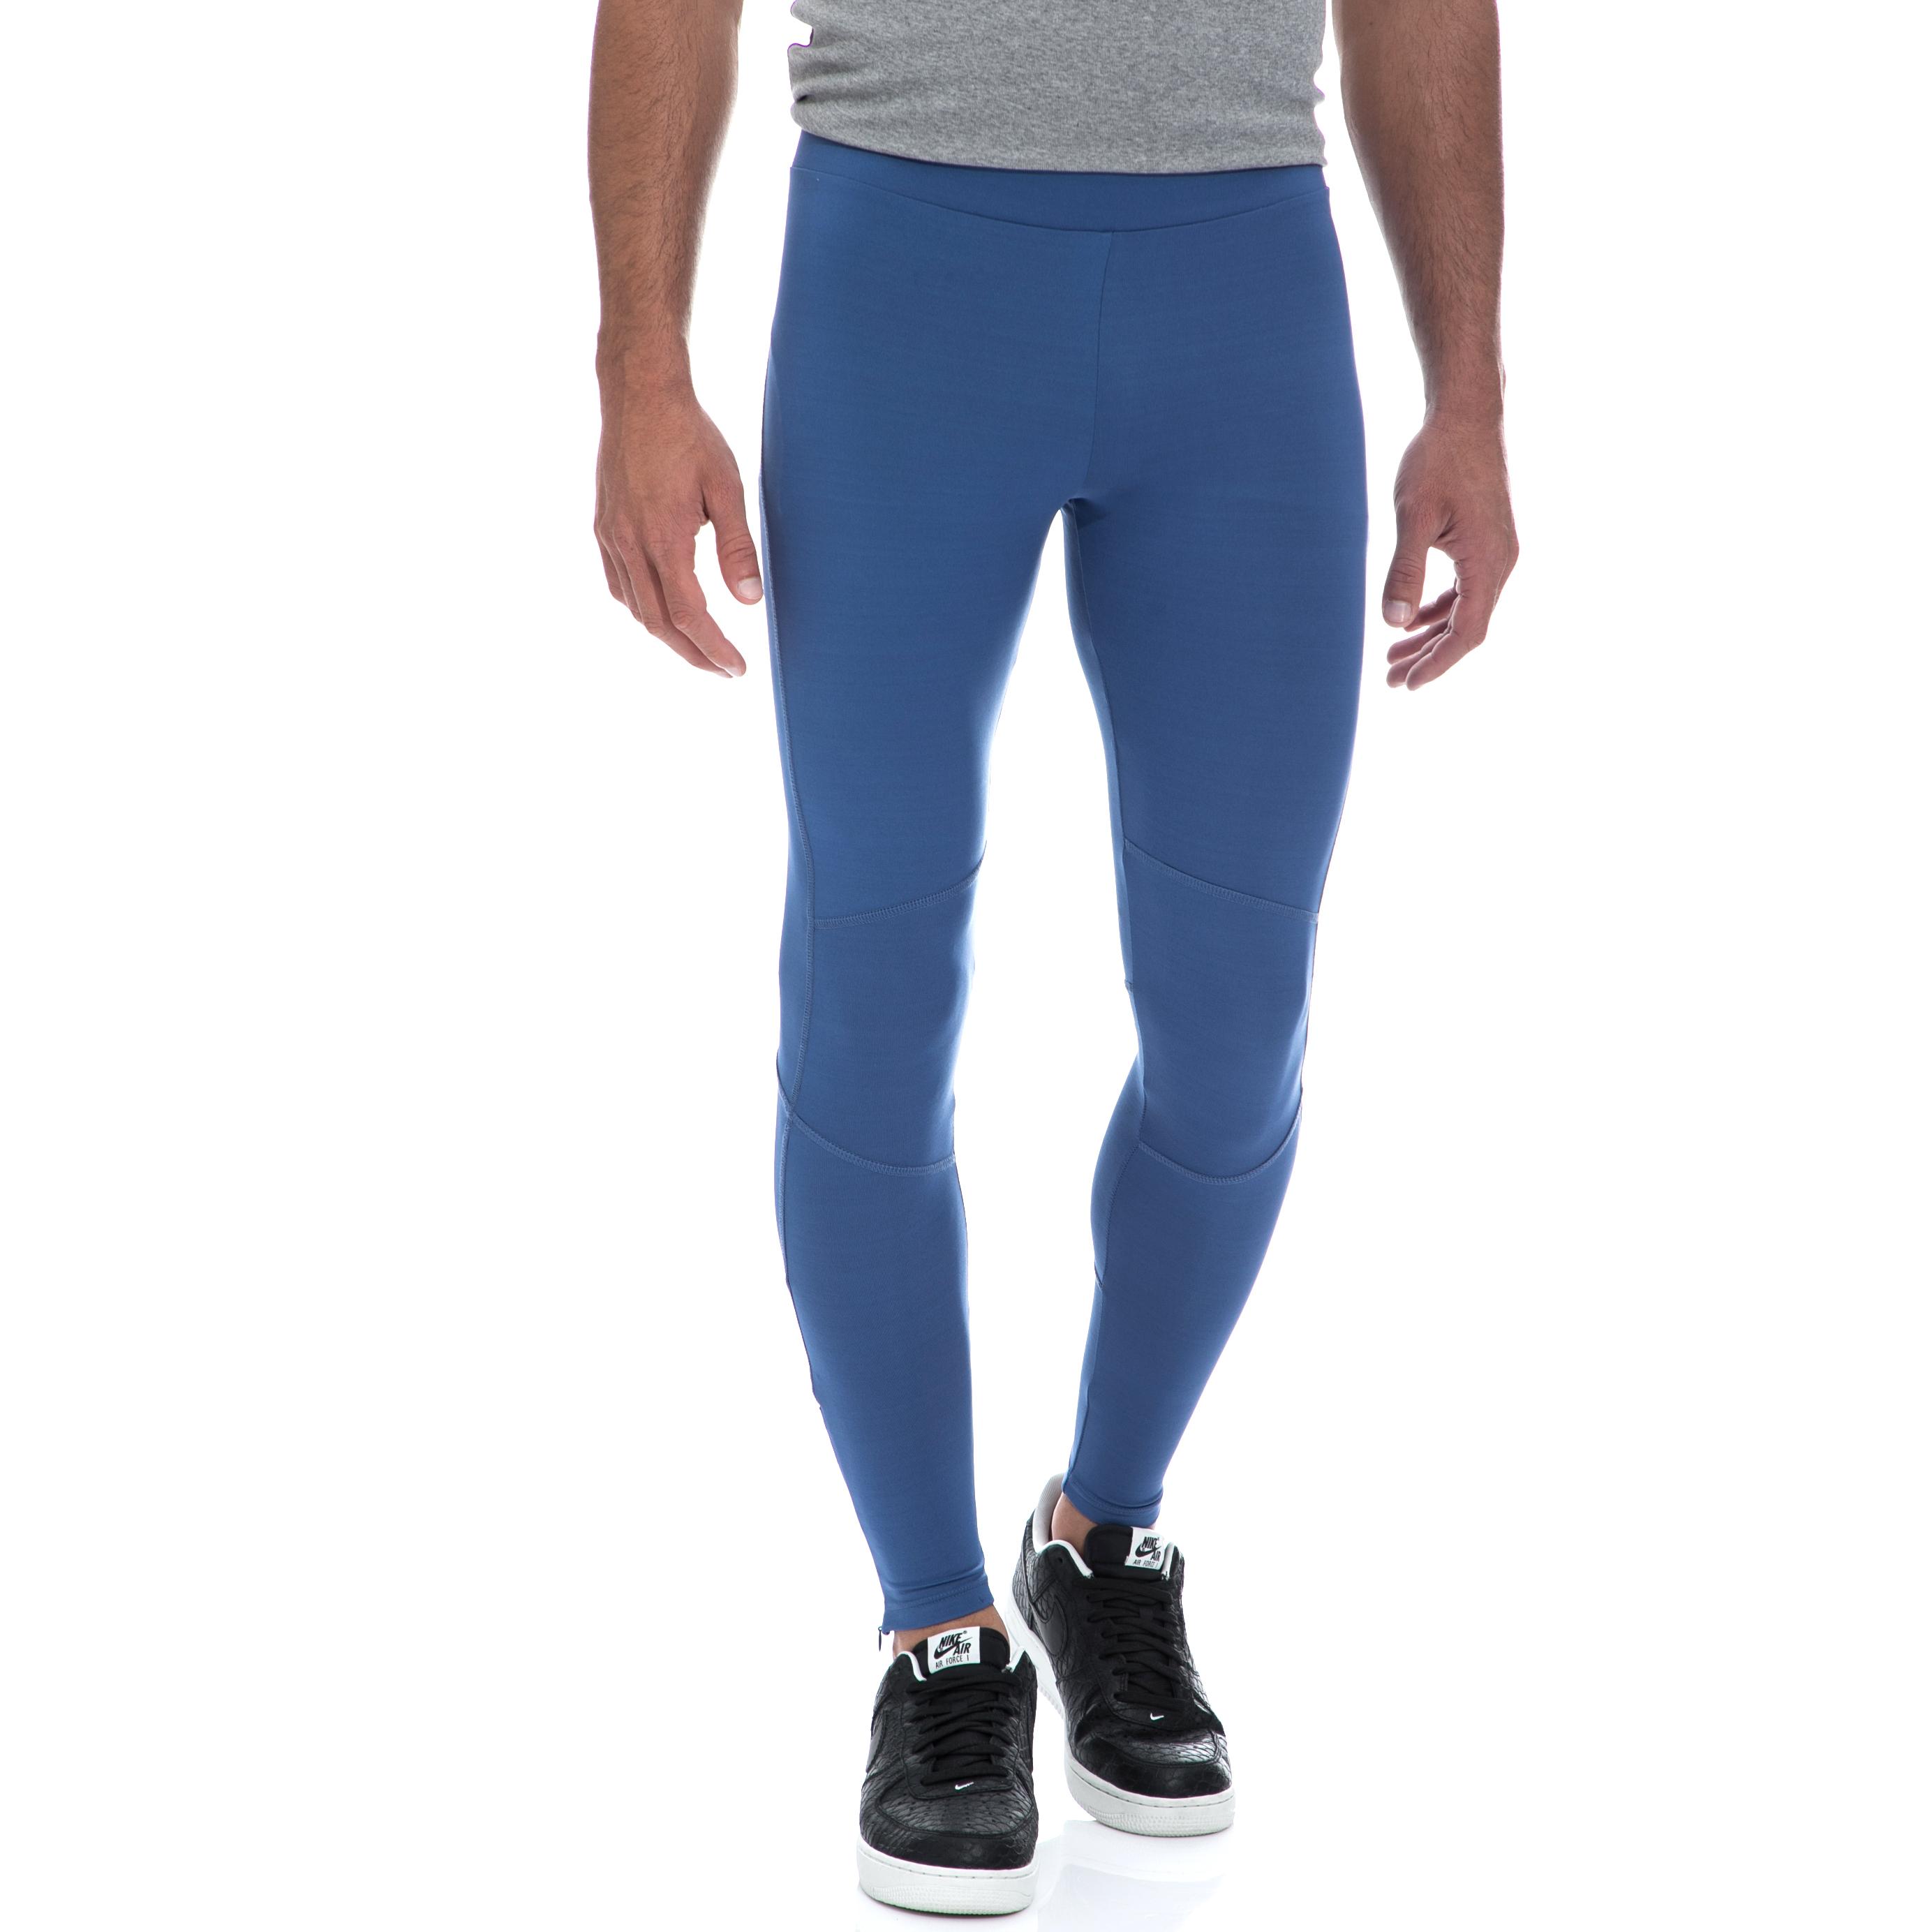 BODYTALK - Ανδρικό κολάν BODYTALK μπλε ανδρικά ρούχα αθλητικά κολάν